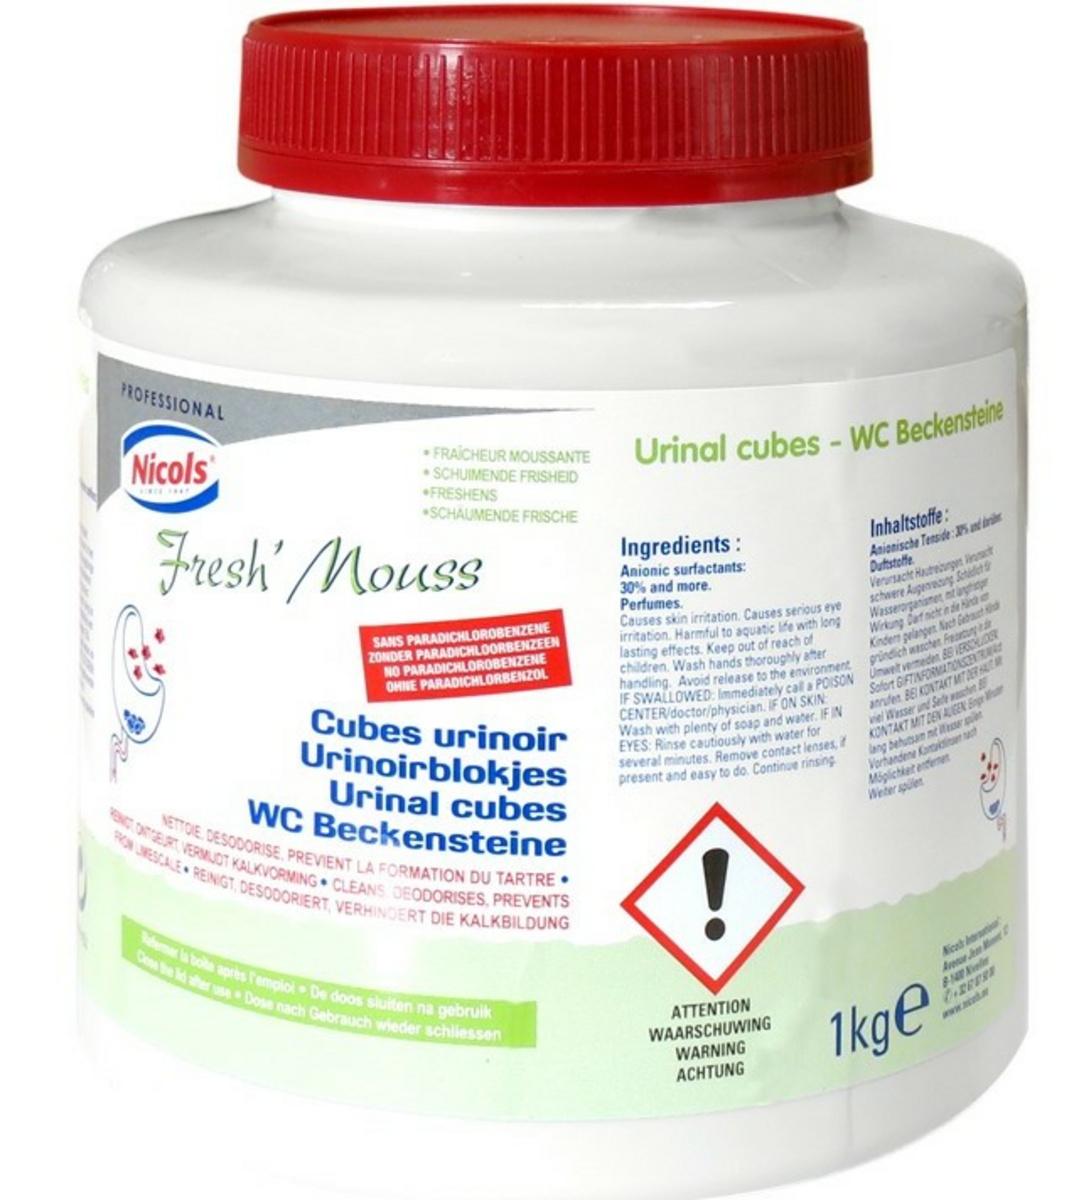 Cube urinoir 40 doses